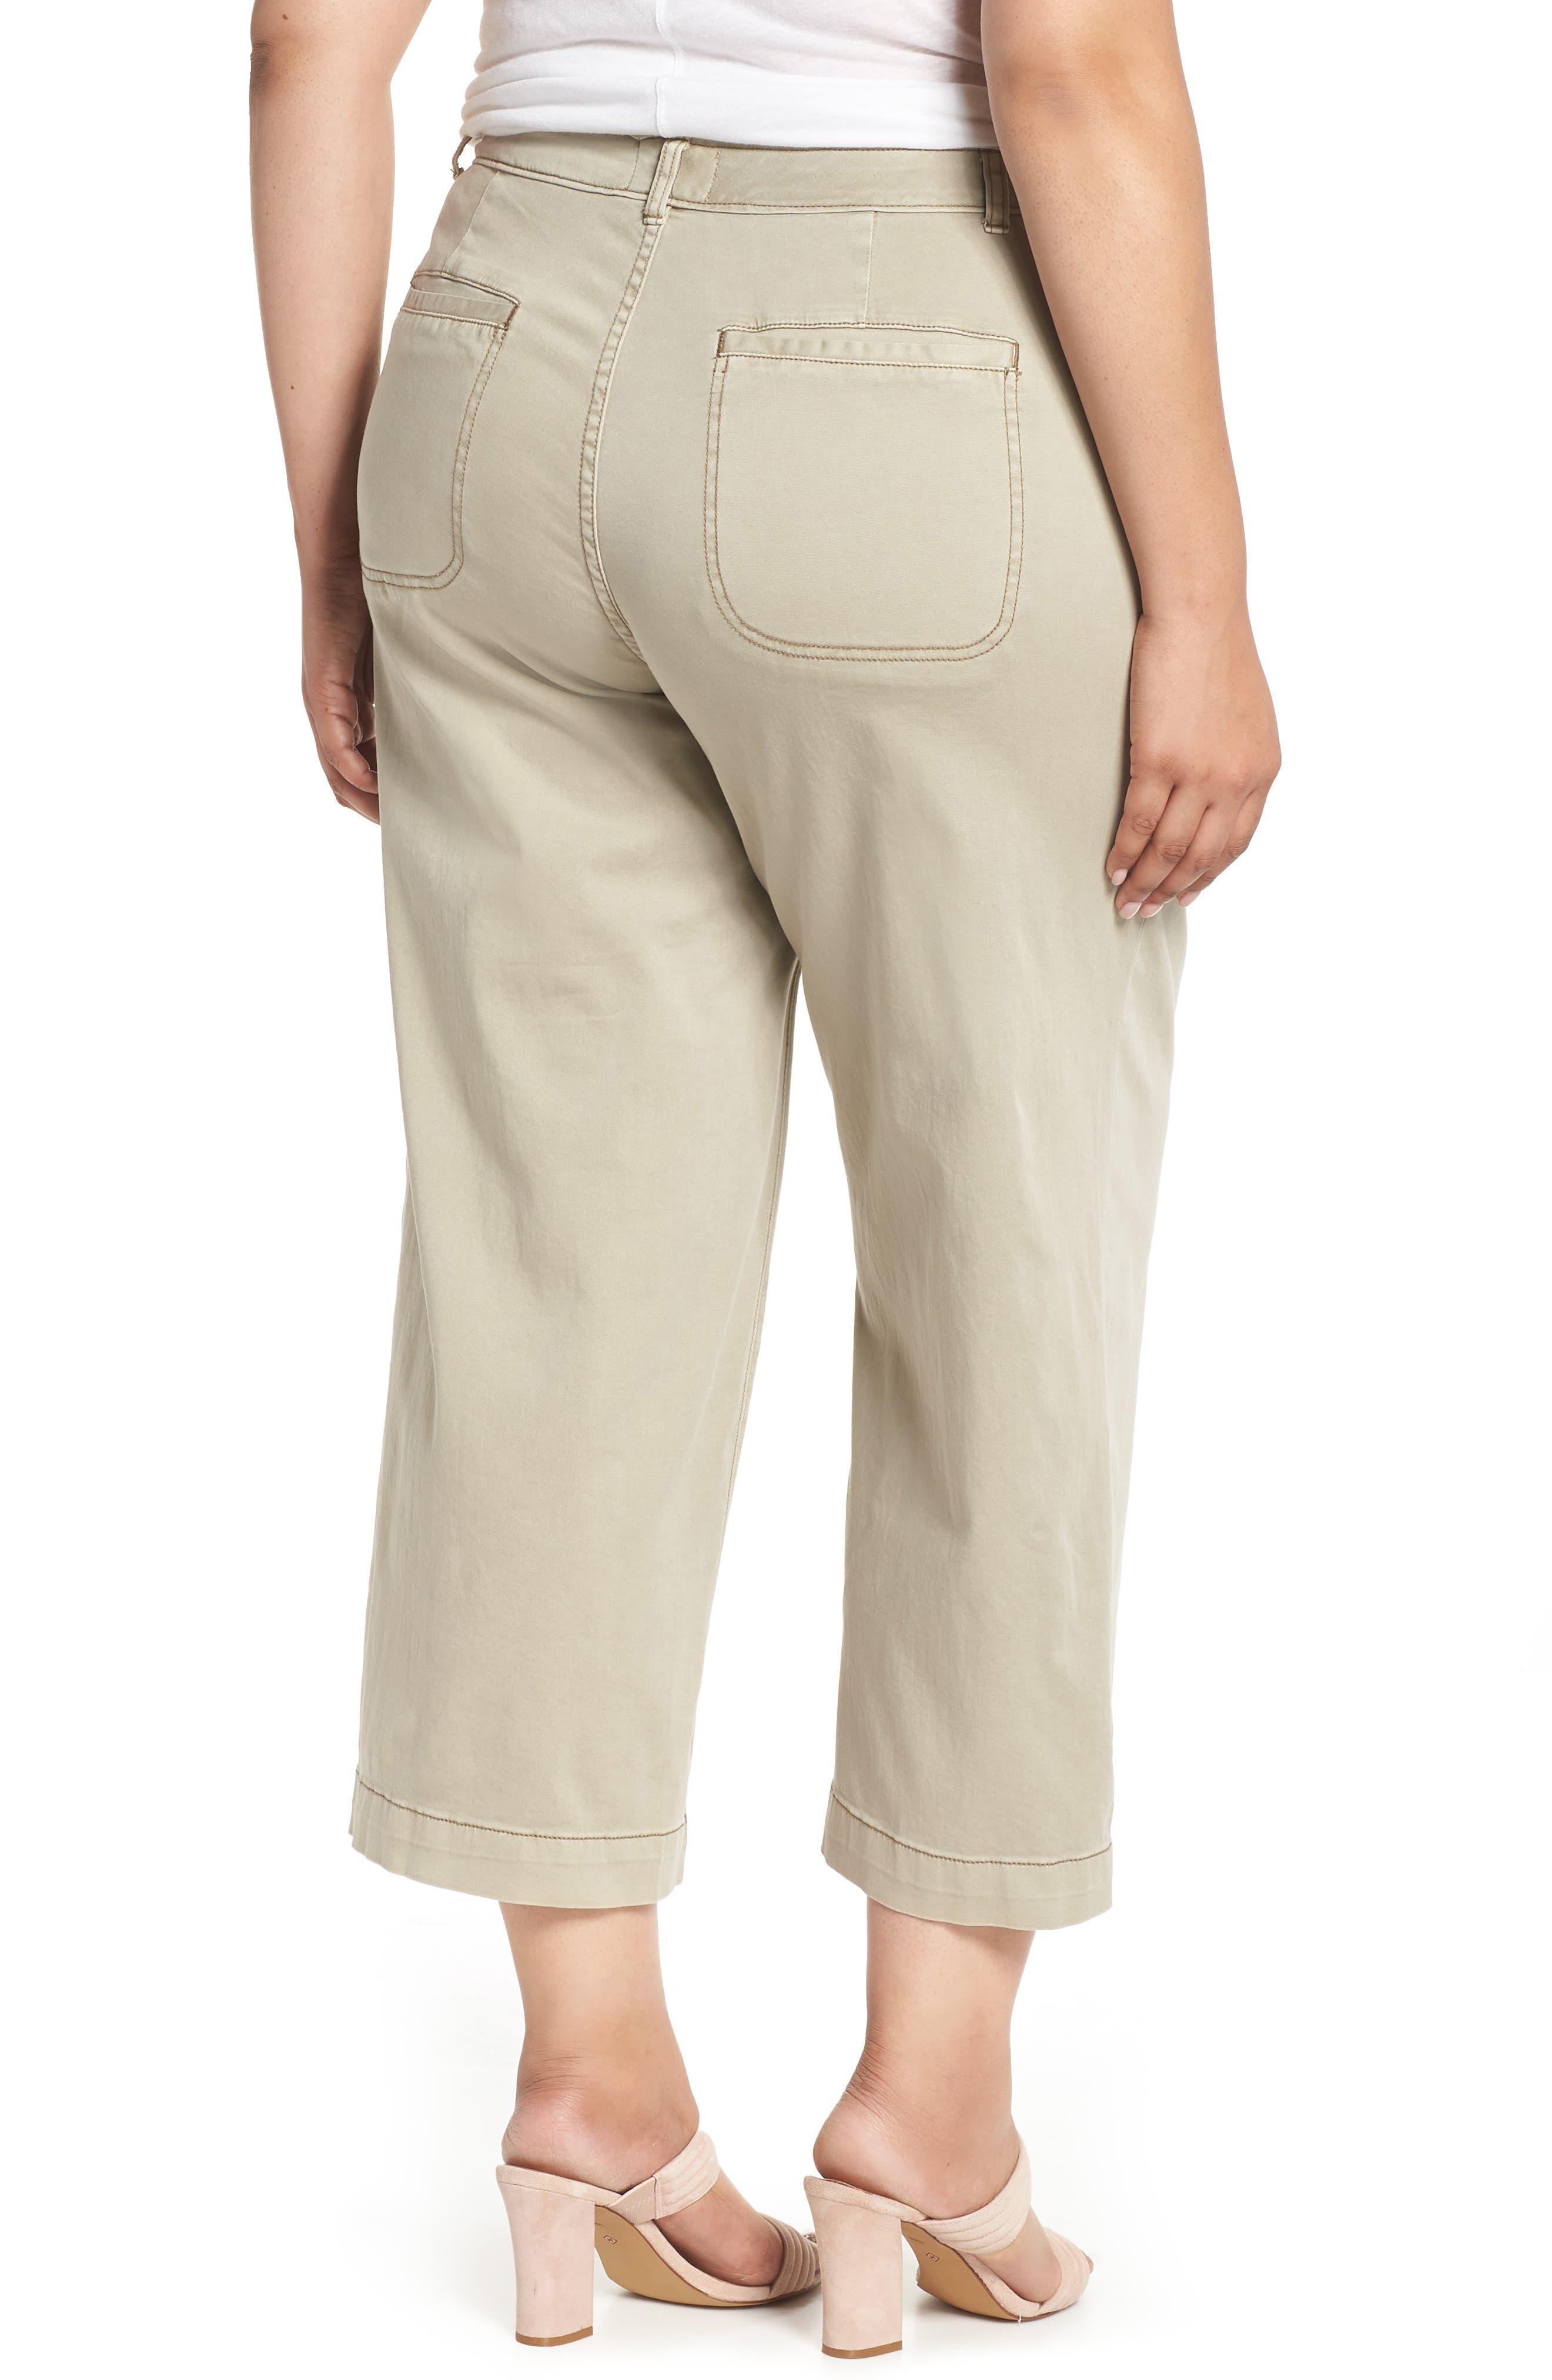 Wide Leg Stretch Cotton Twill Crop Pants,                             Alternate thumbnail 2, color,                             Tan Cobblestone